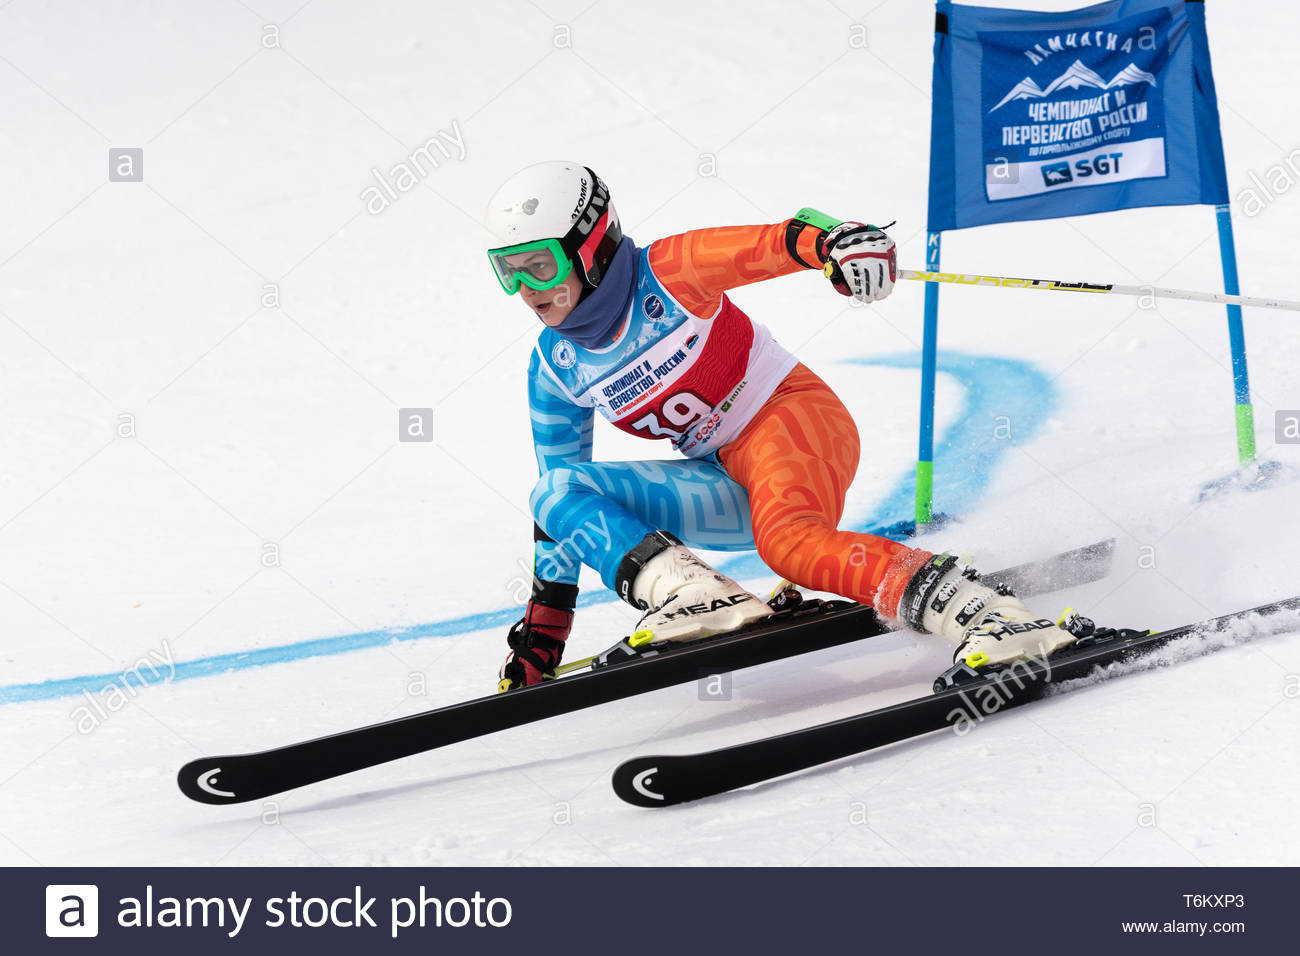 KAMCHATKA PENINSULA, RUSSIA - APR 2, 2019: International Ski Federation Championship, Russian Women's Alpine Skiing Cup giant slalom. Mountain skier V - Stock Image